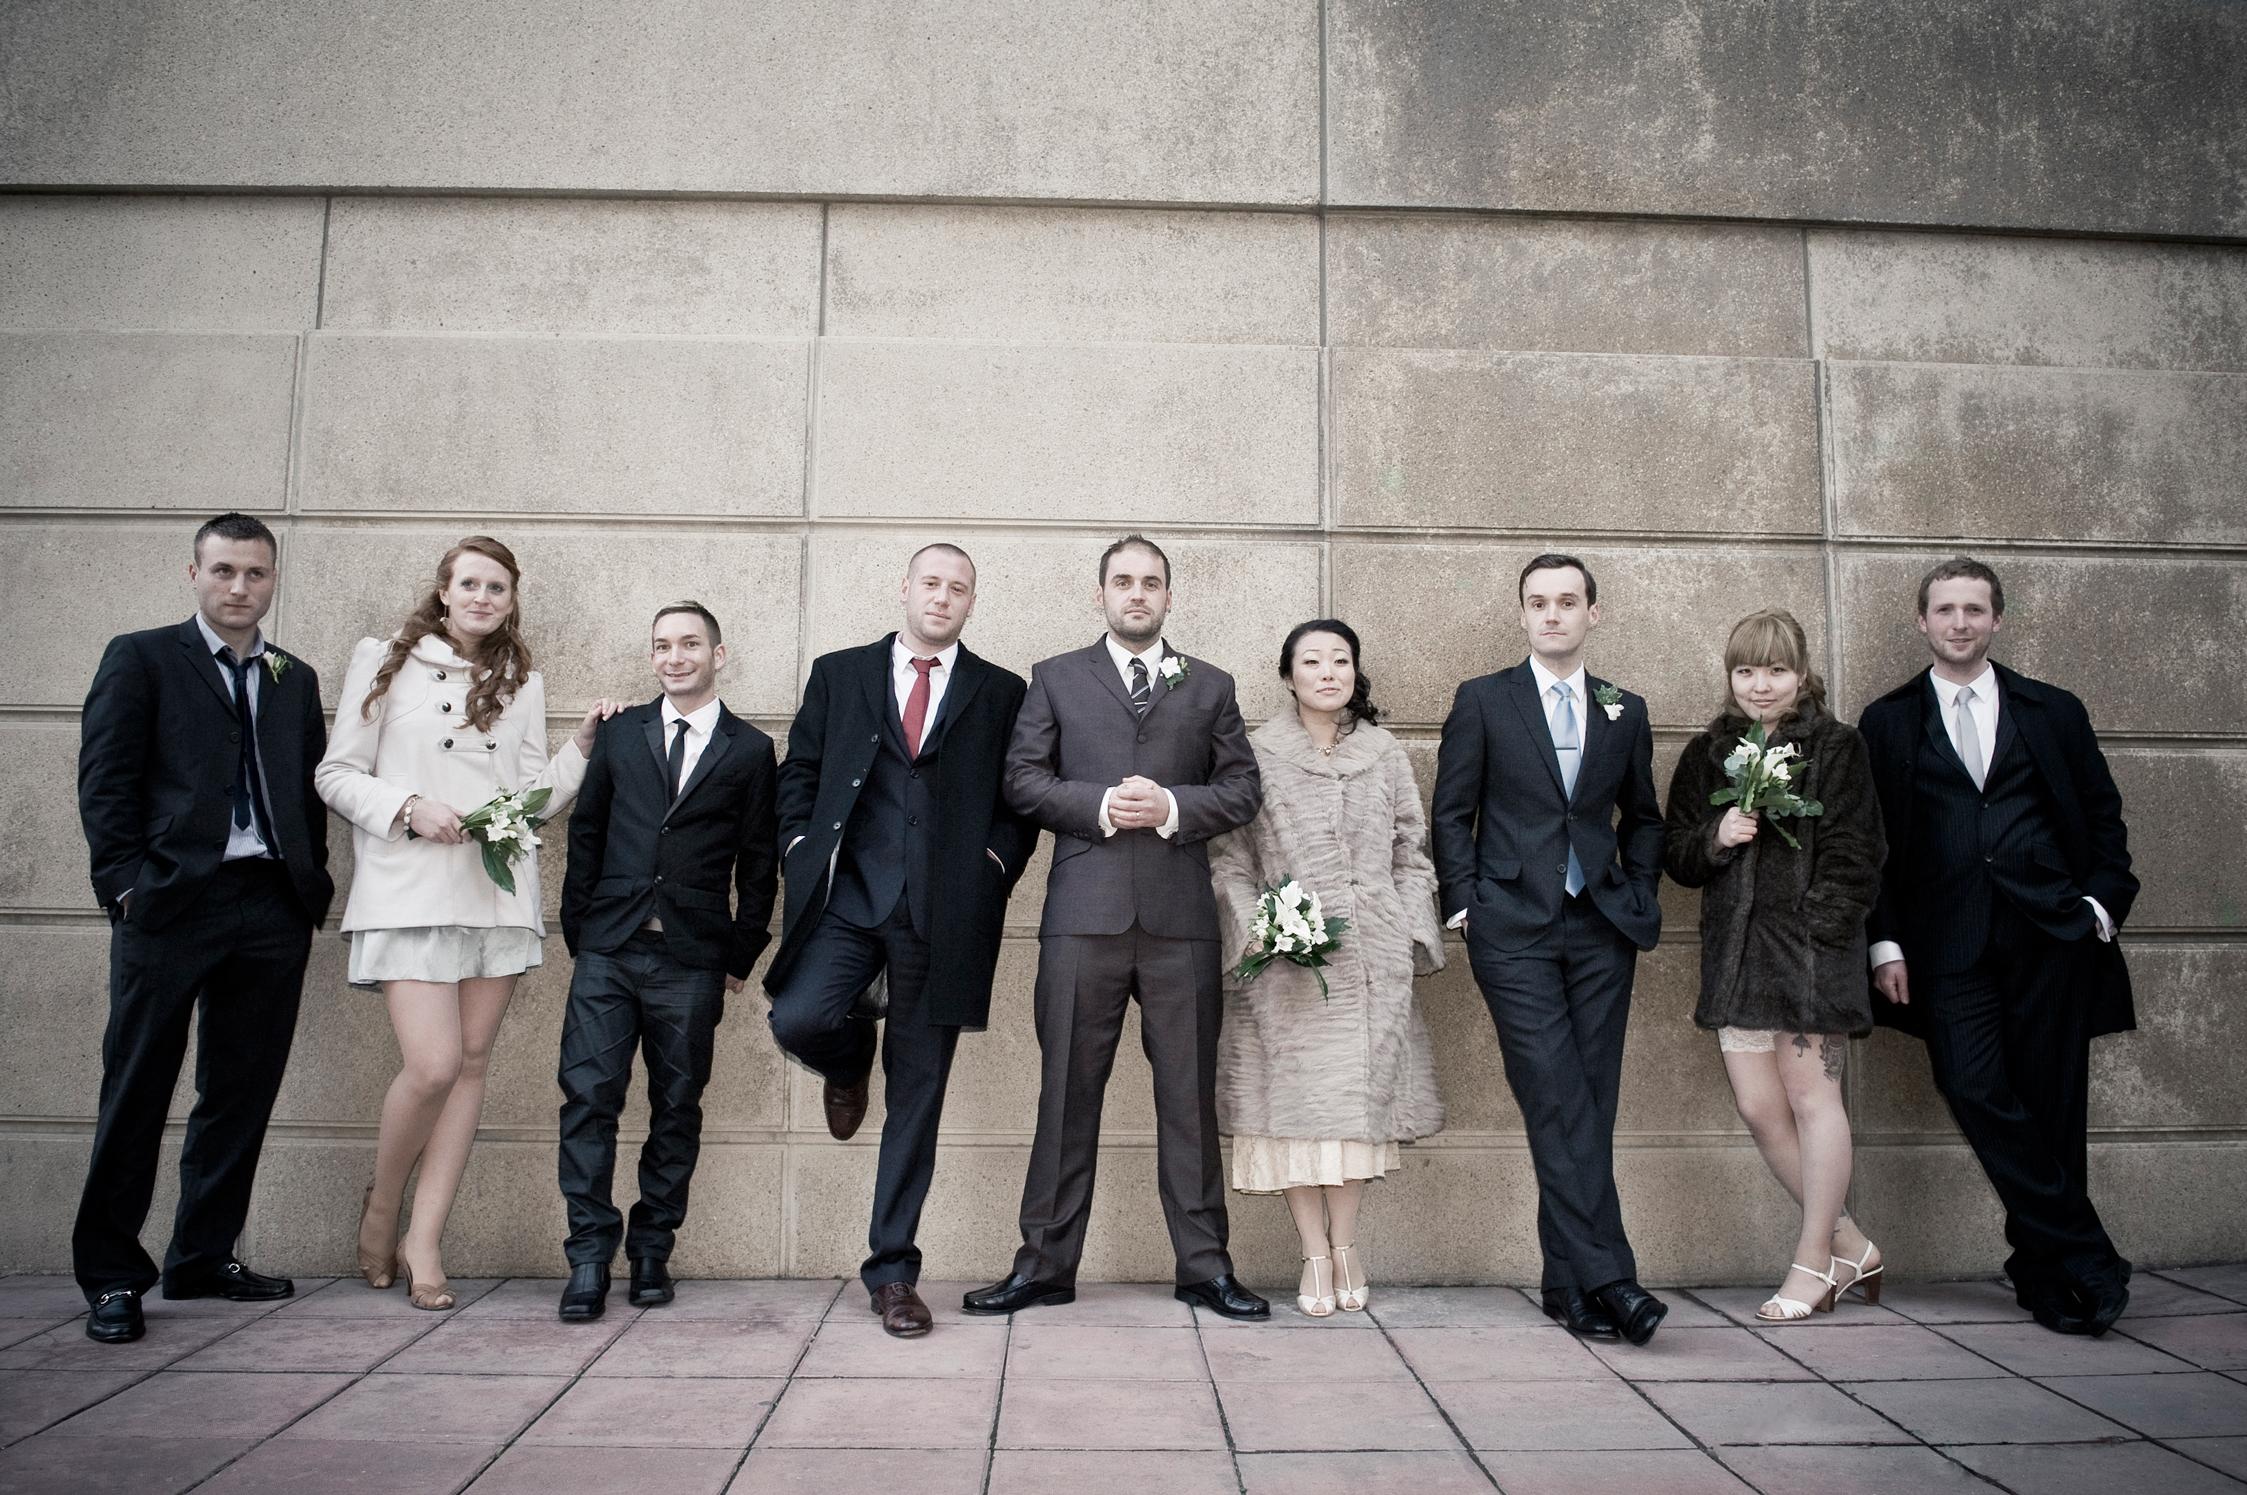 brighton_winter_wedding_12.jpg